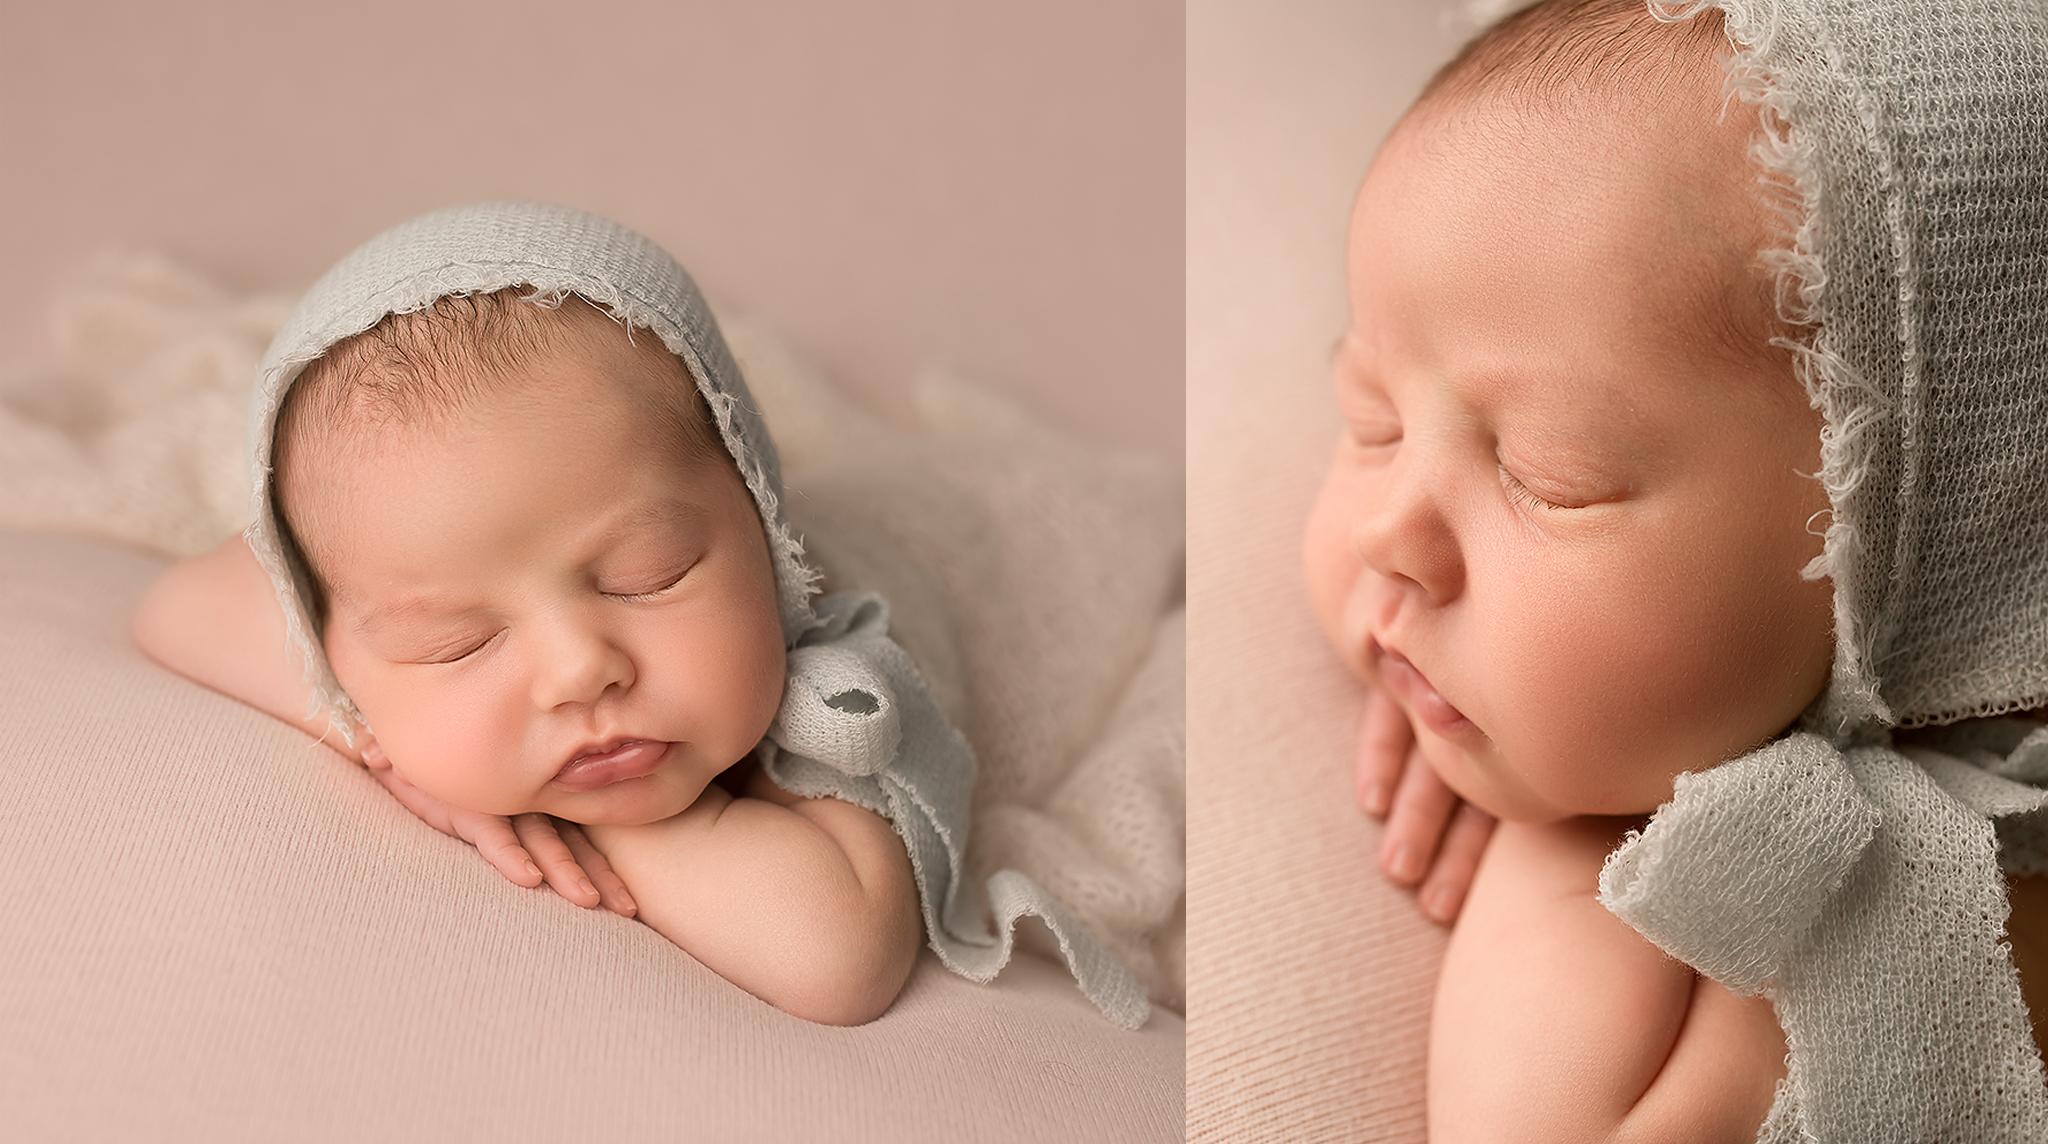 Baltimore Howard County Maryland Newborn Photographer Jessica Fenfert baby girl head on hands